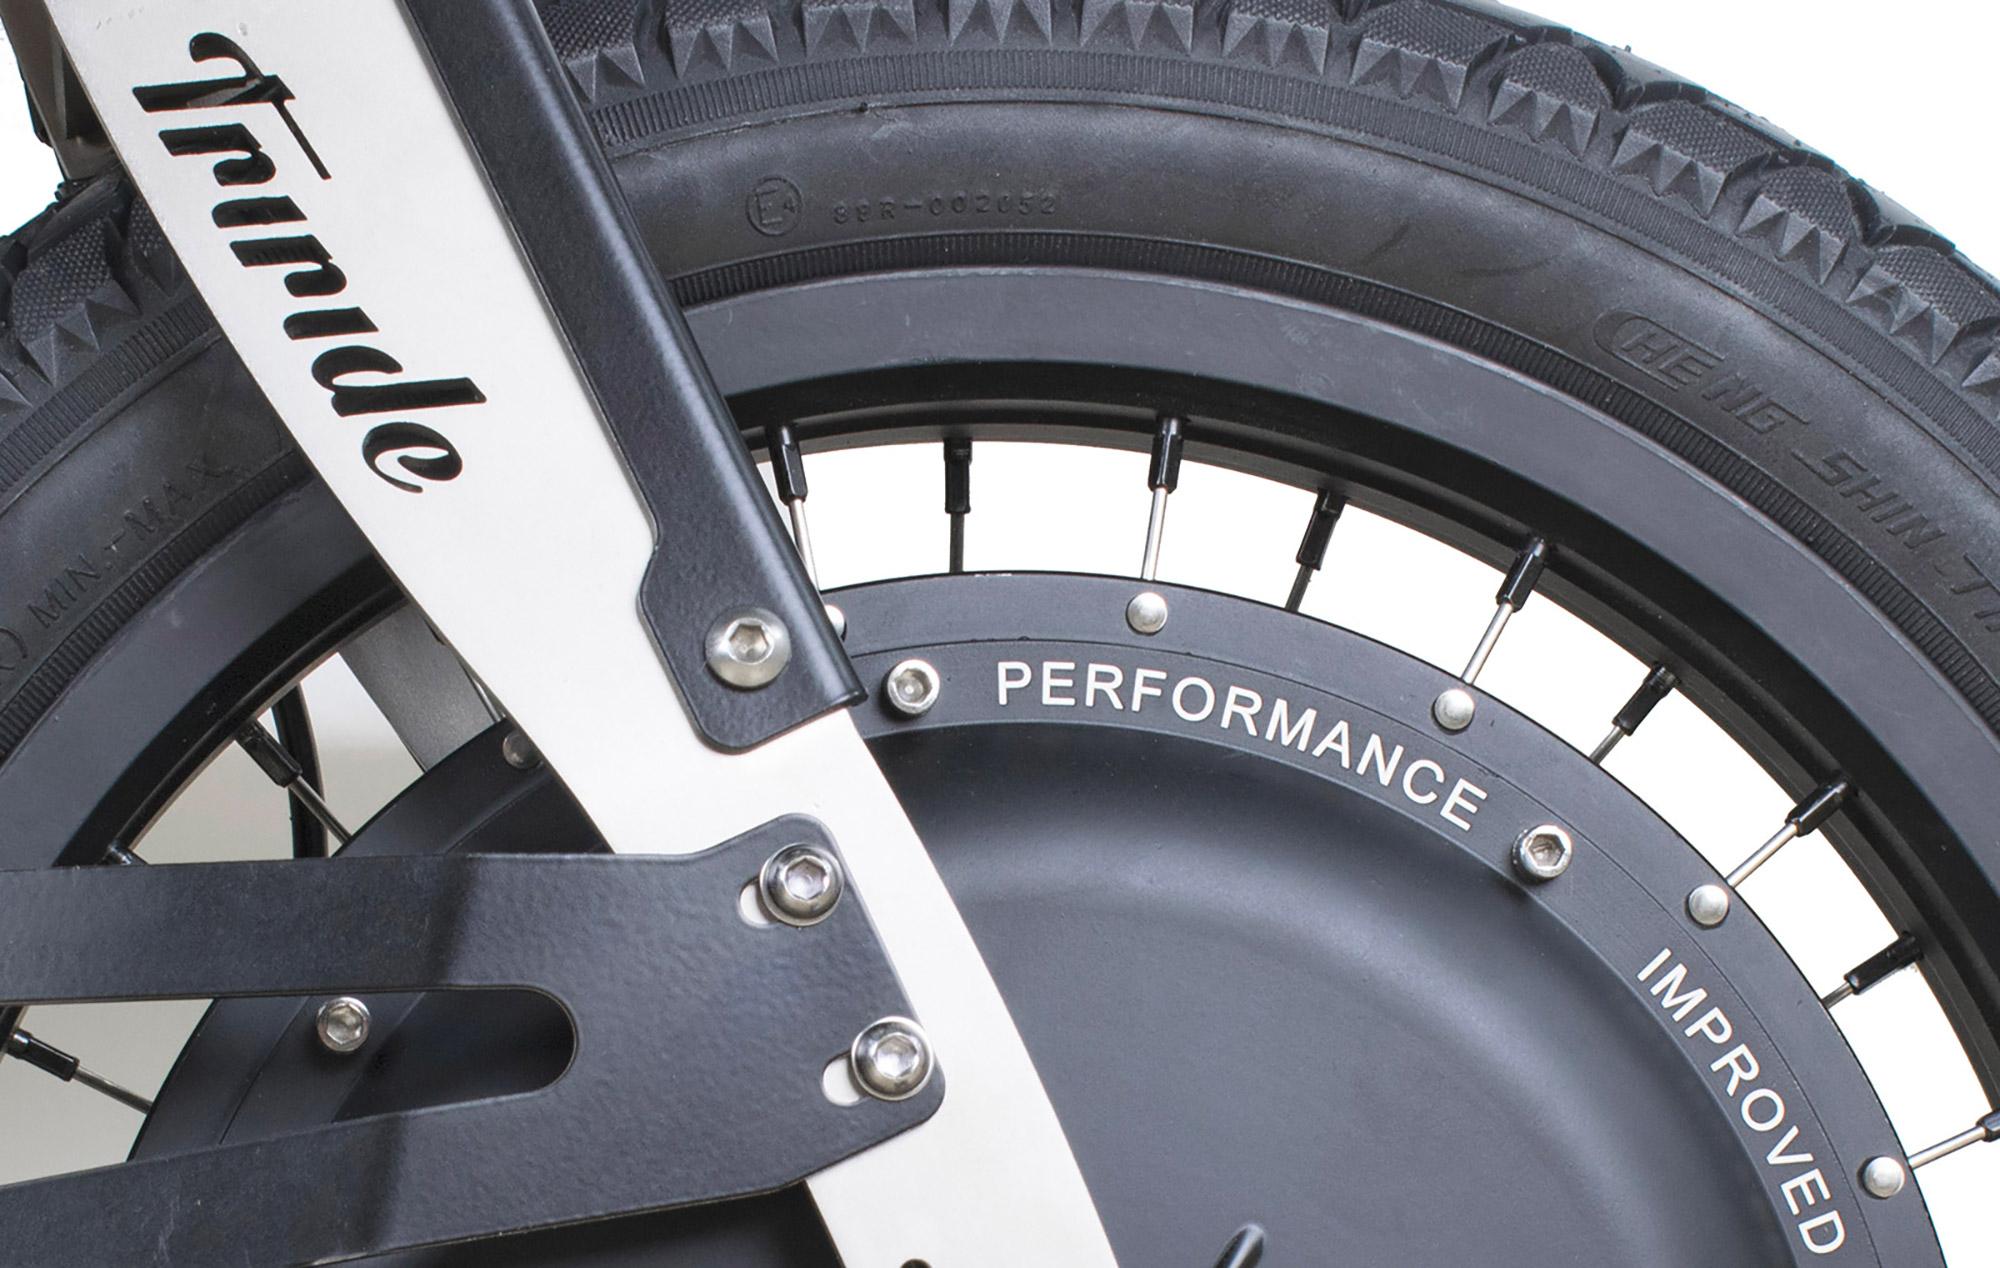 triride-special-l14-dettaglio-motore.jpg